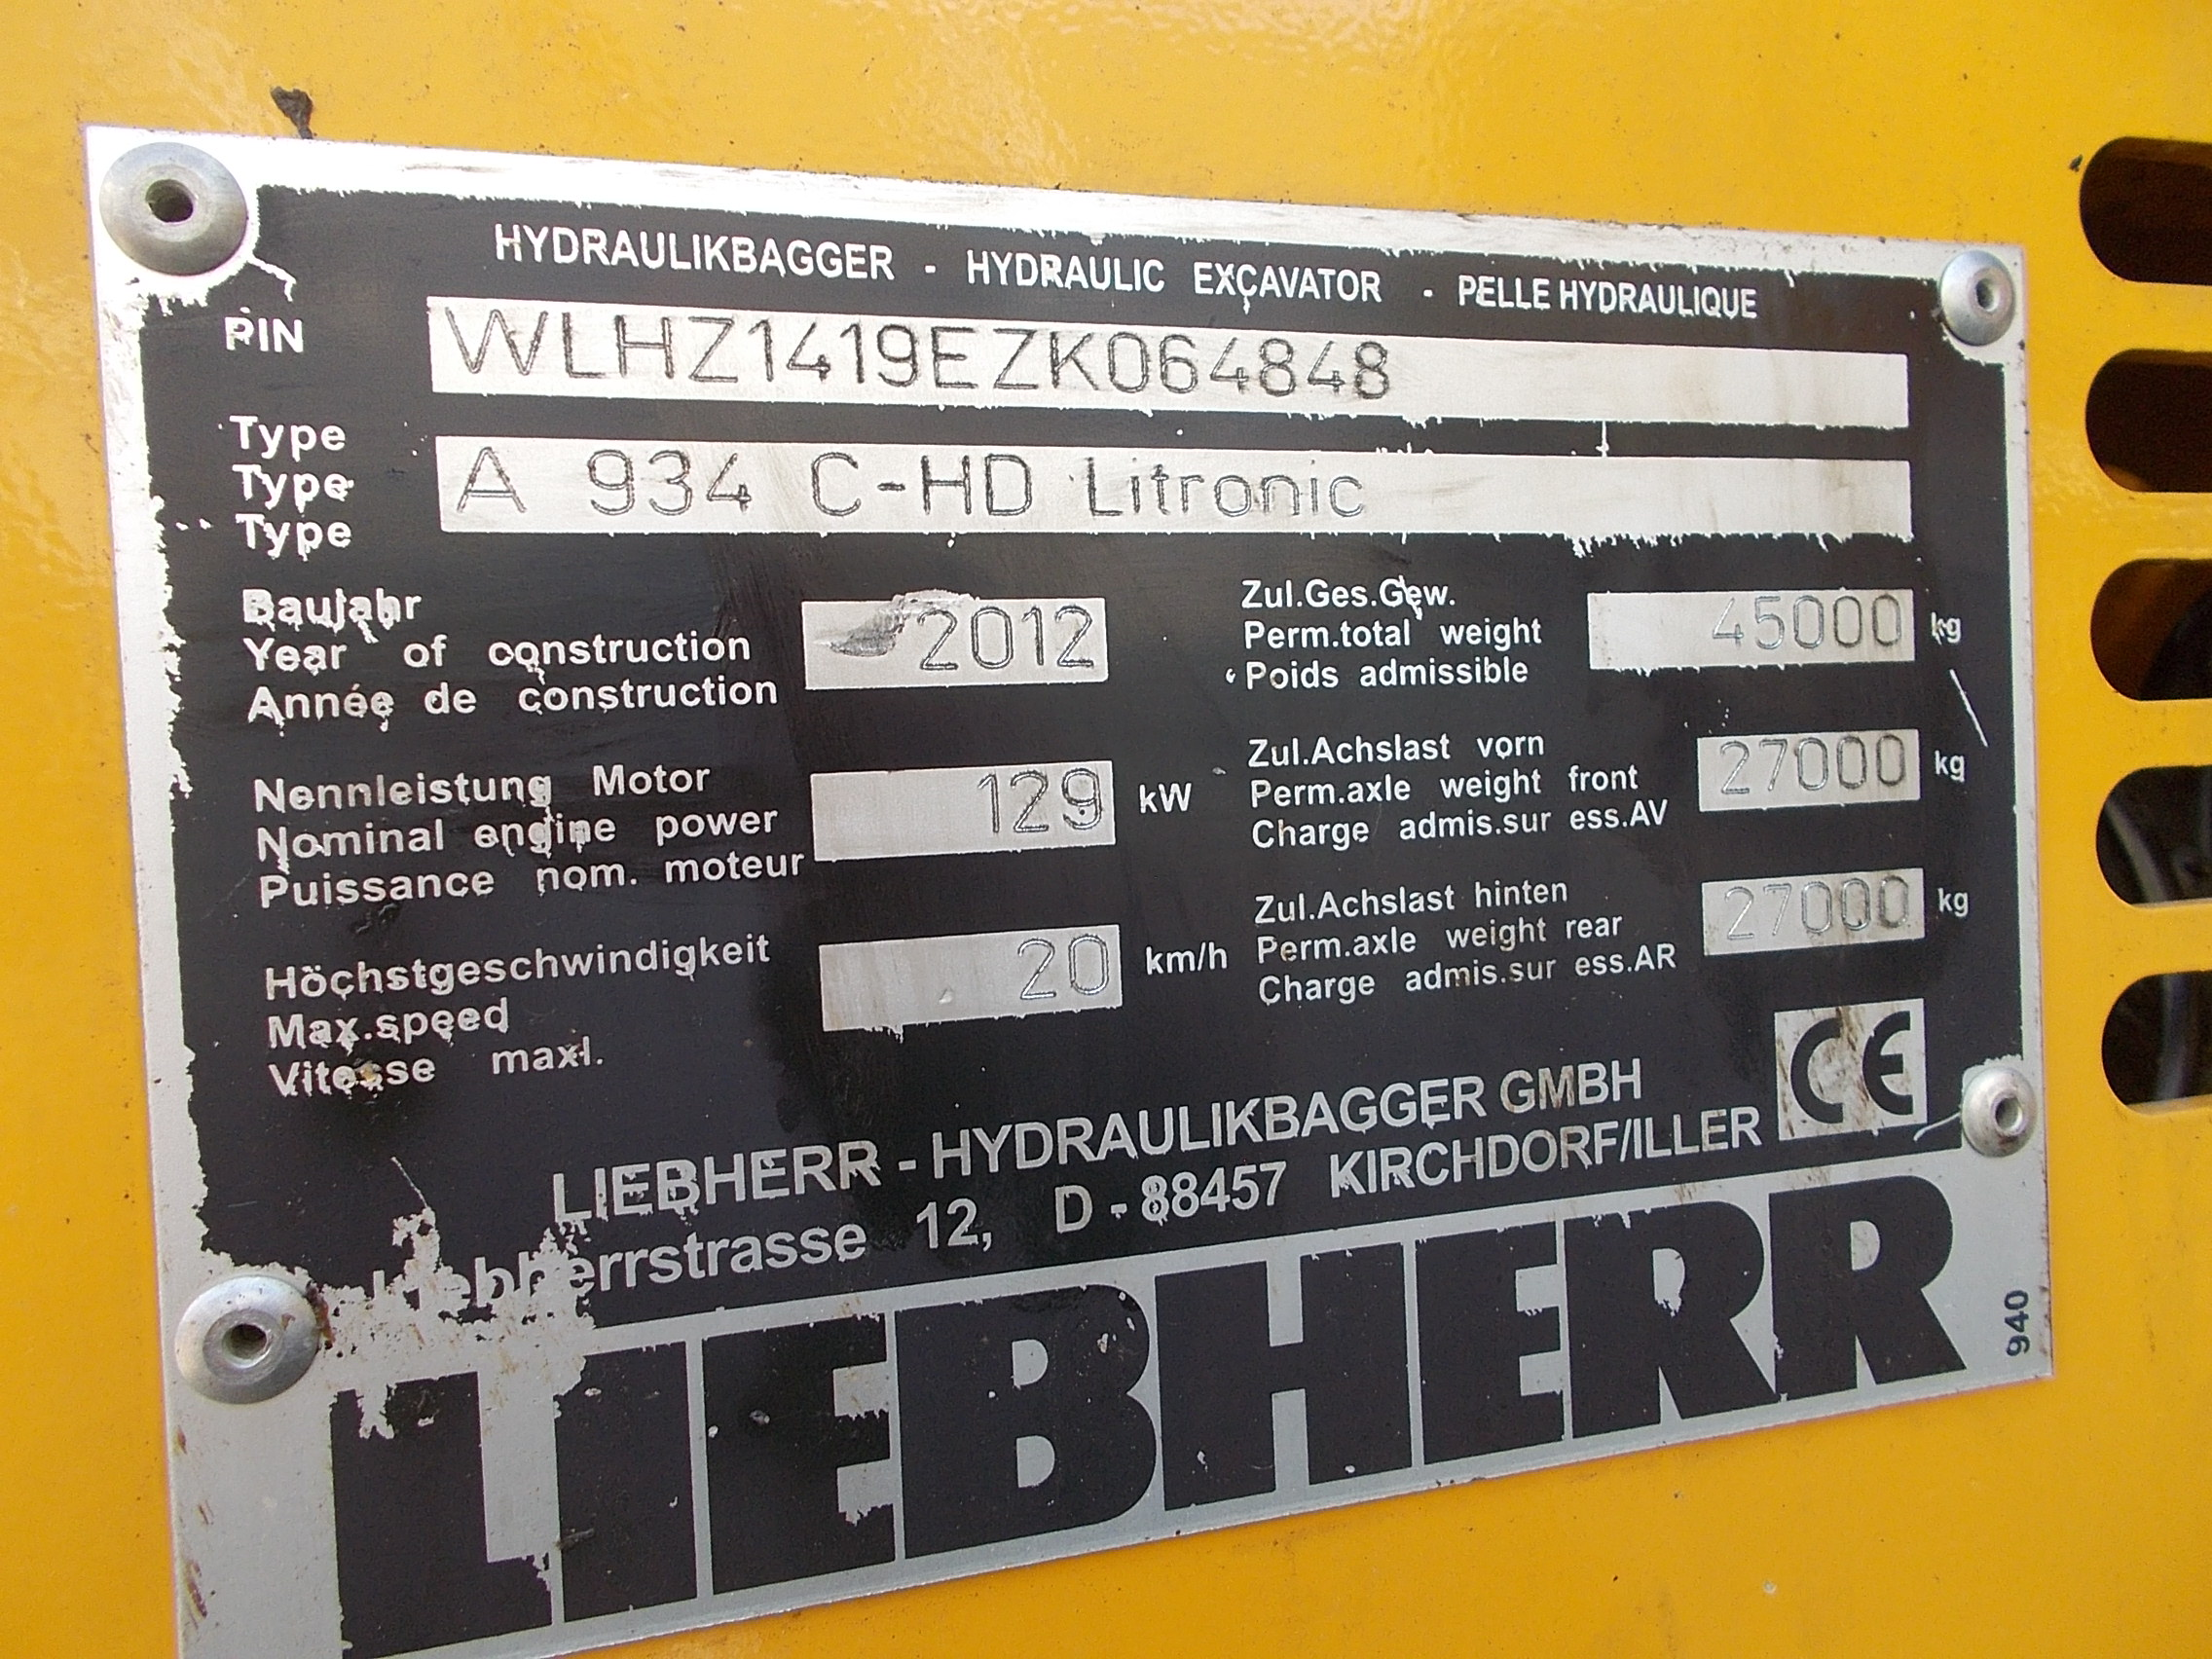 A 934C HD IND LI -1419-64848_024.JPG